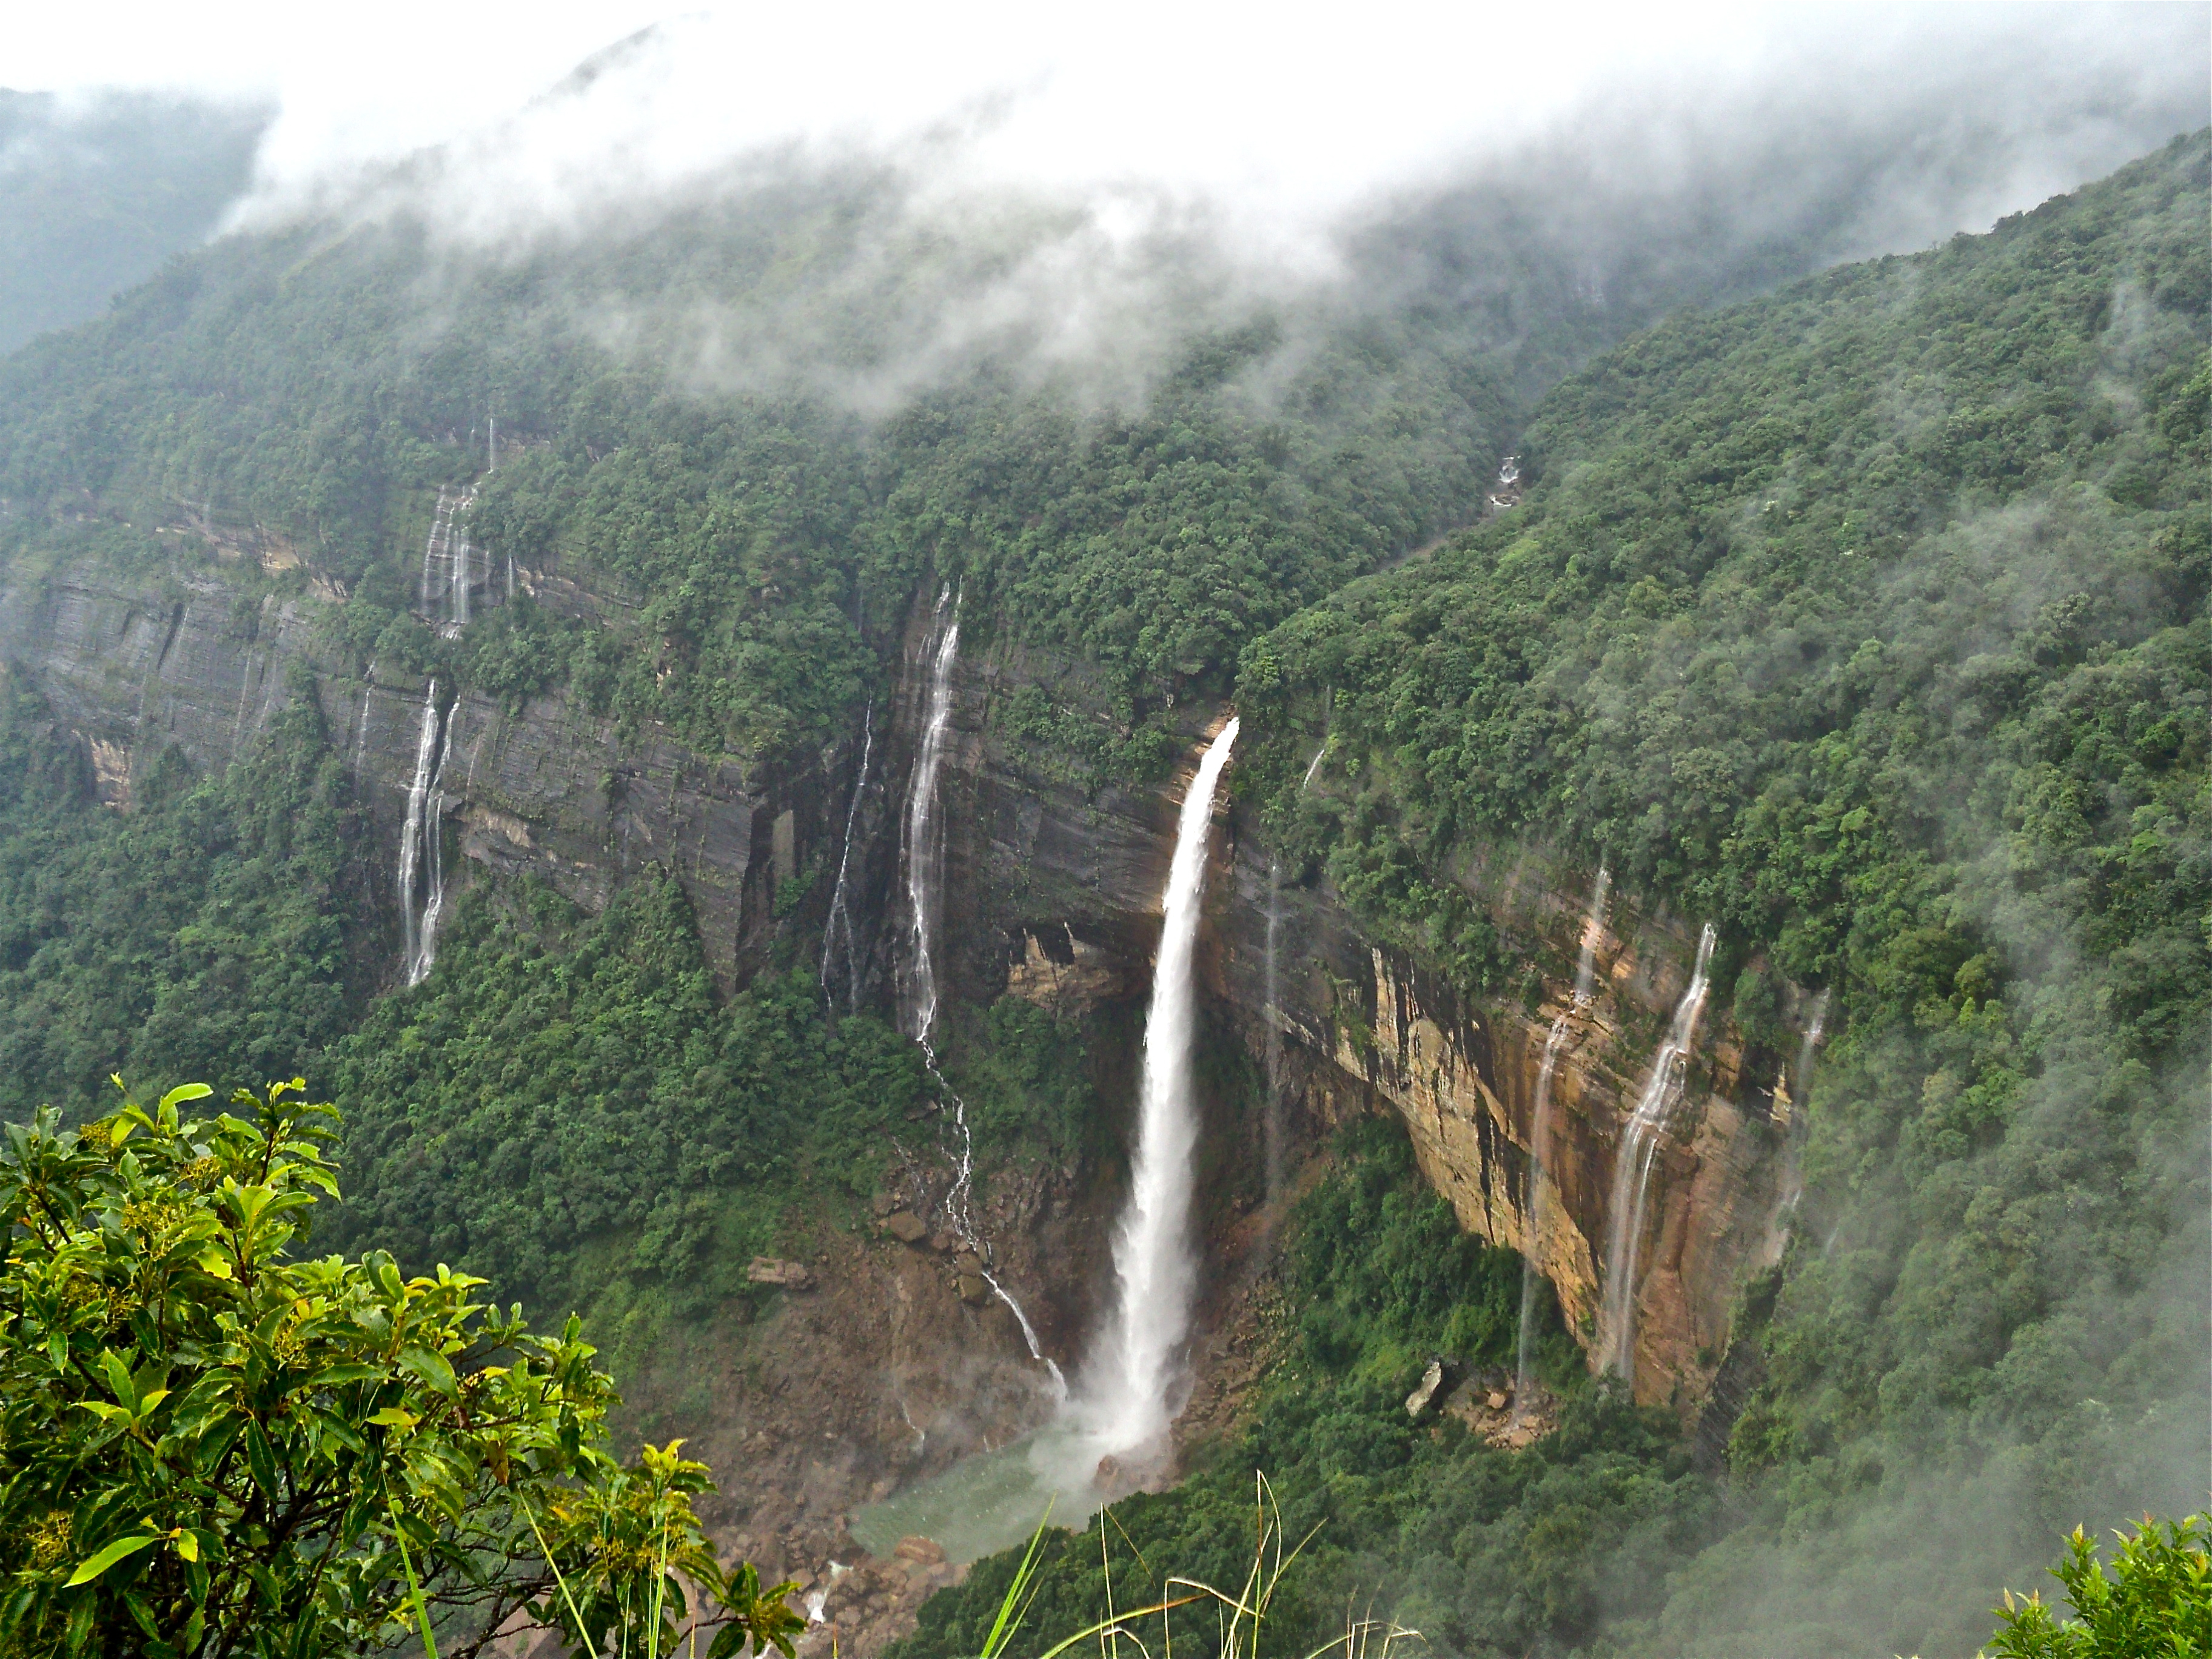 Photo Credit http://commons.wikimedia.org/wiki/File:Nohkalikai_Falls_Cherrapunji.JPG